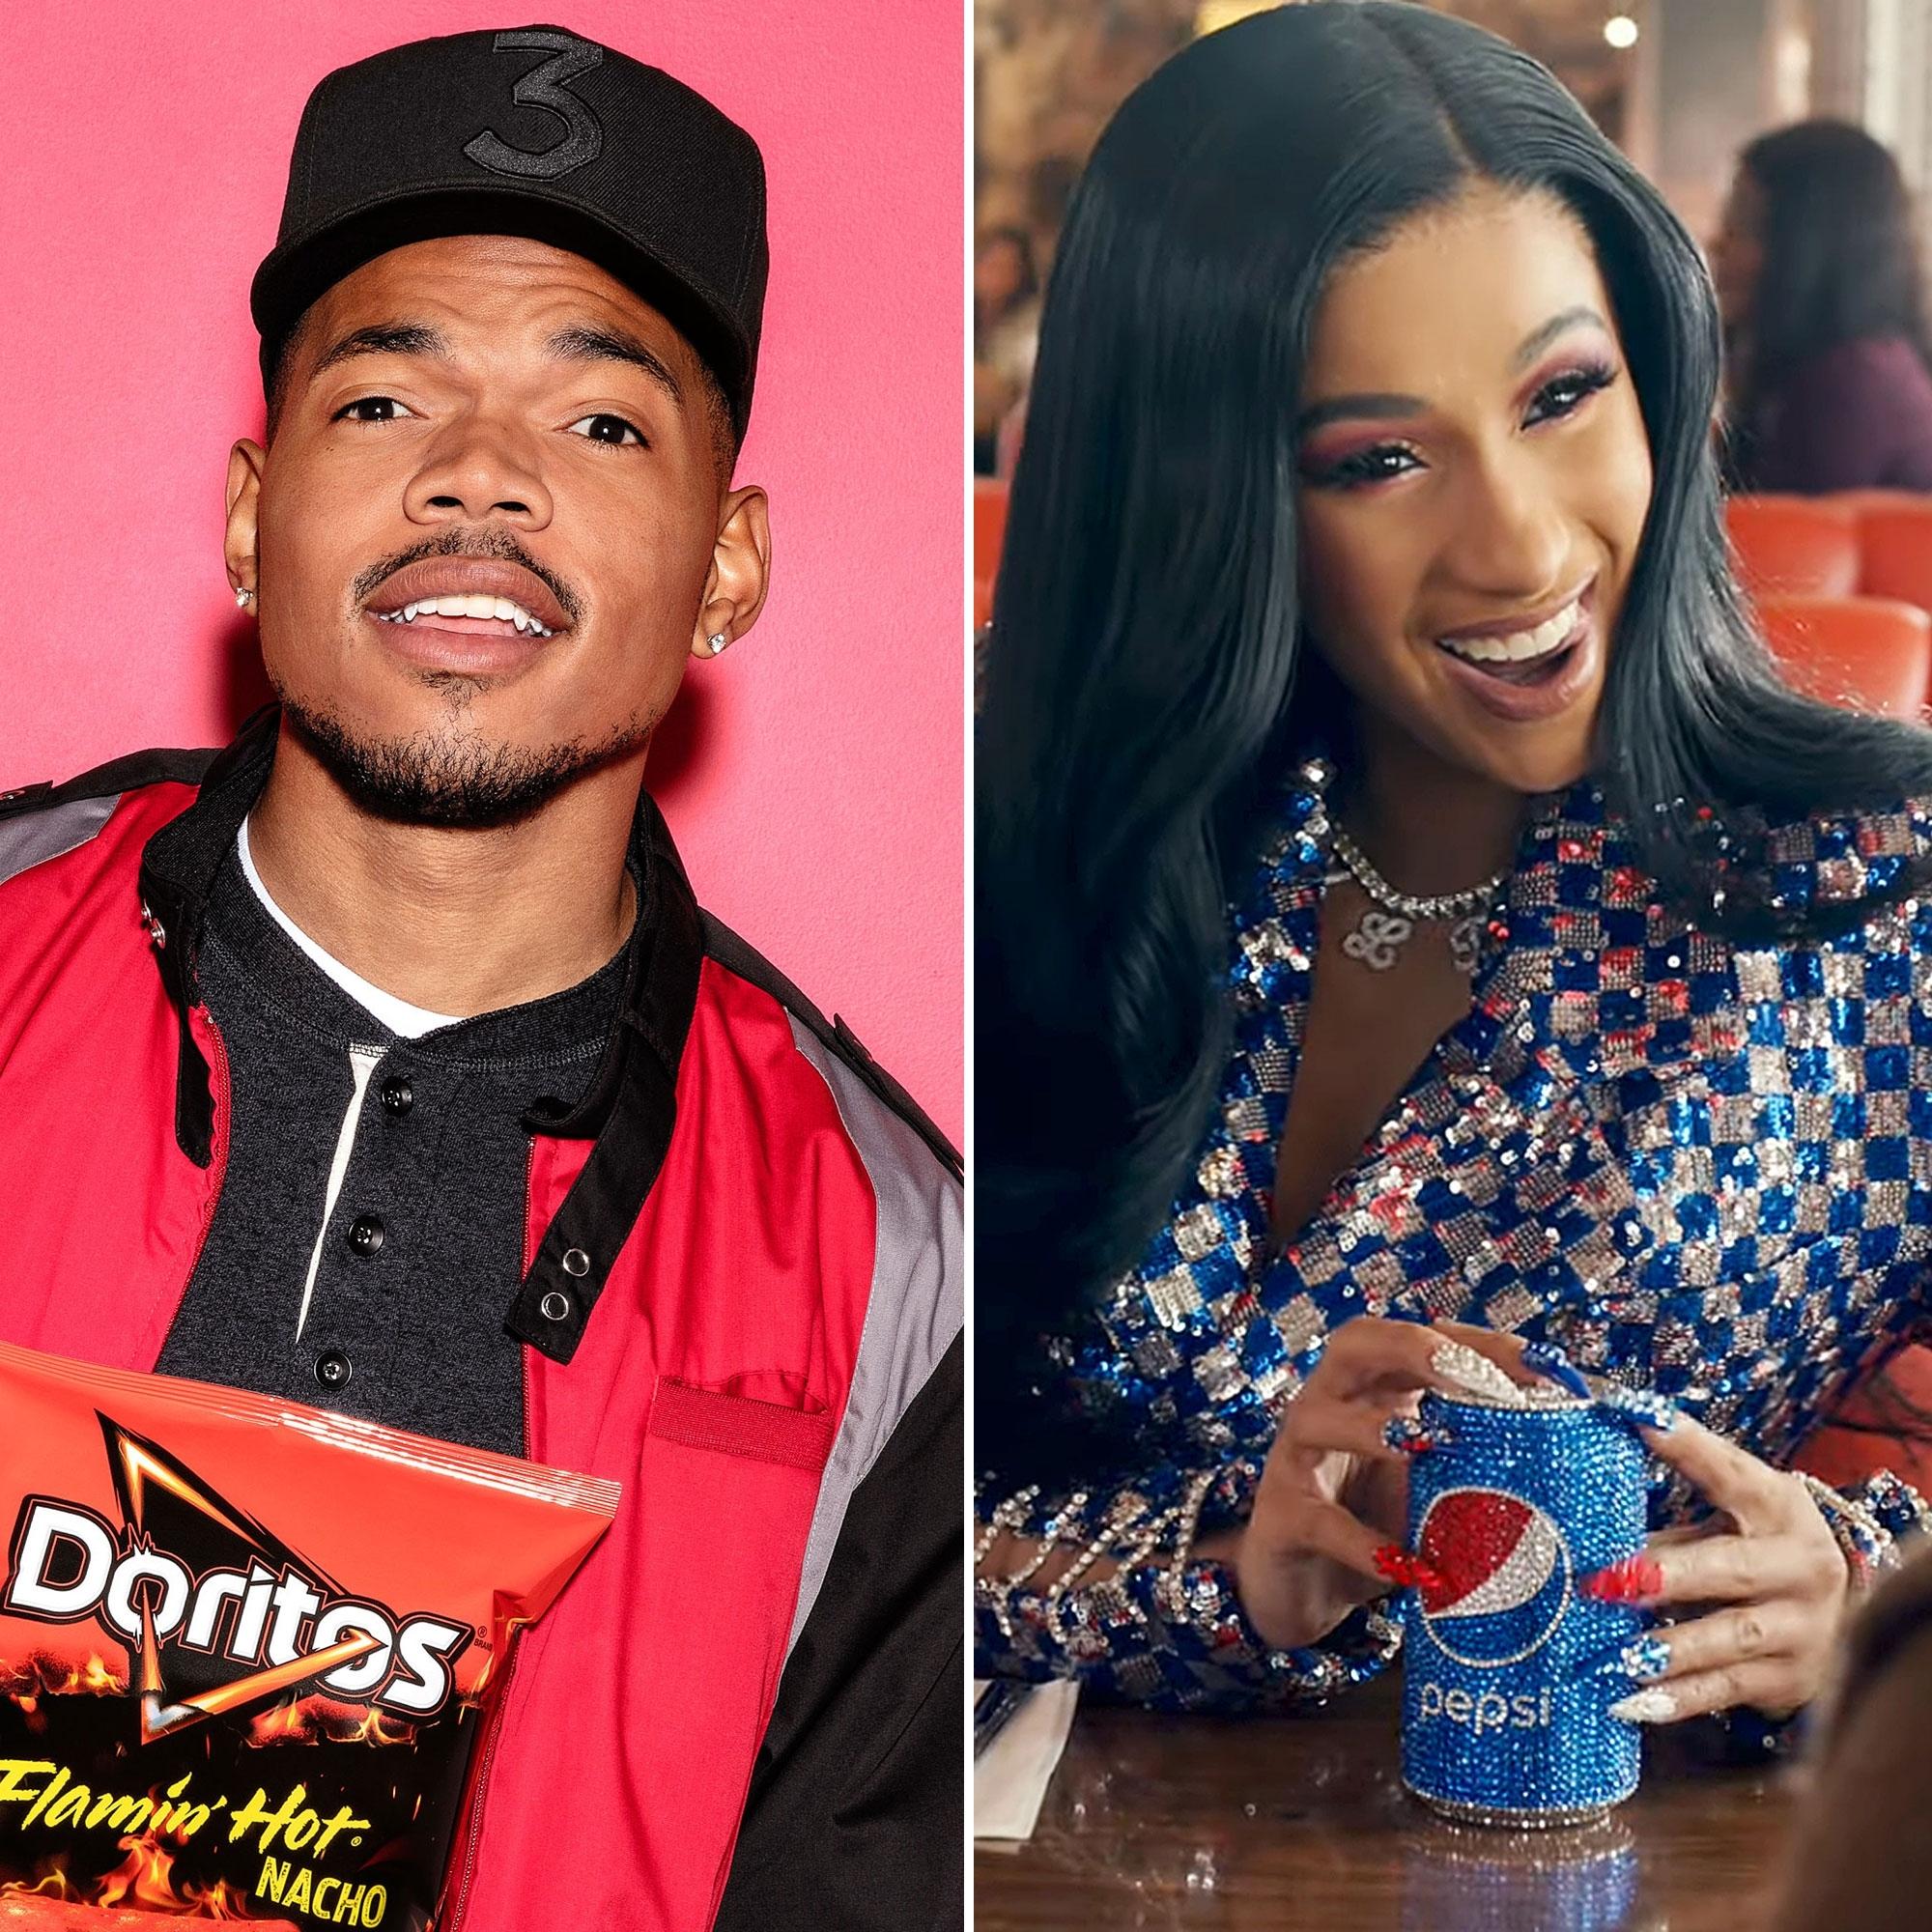 Super Bowl 2019 Food Commercials: Pepsi, Pringles, More inside Pepsi Super Bowl 2019